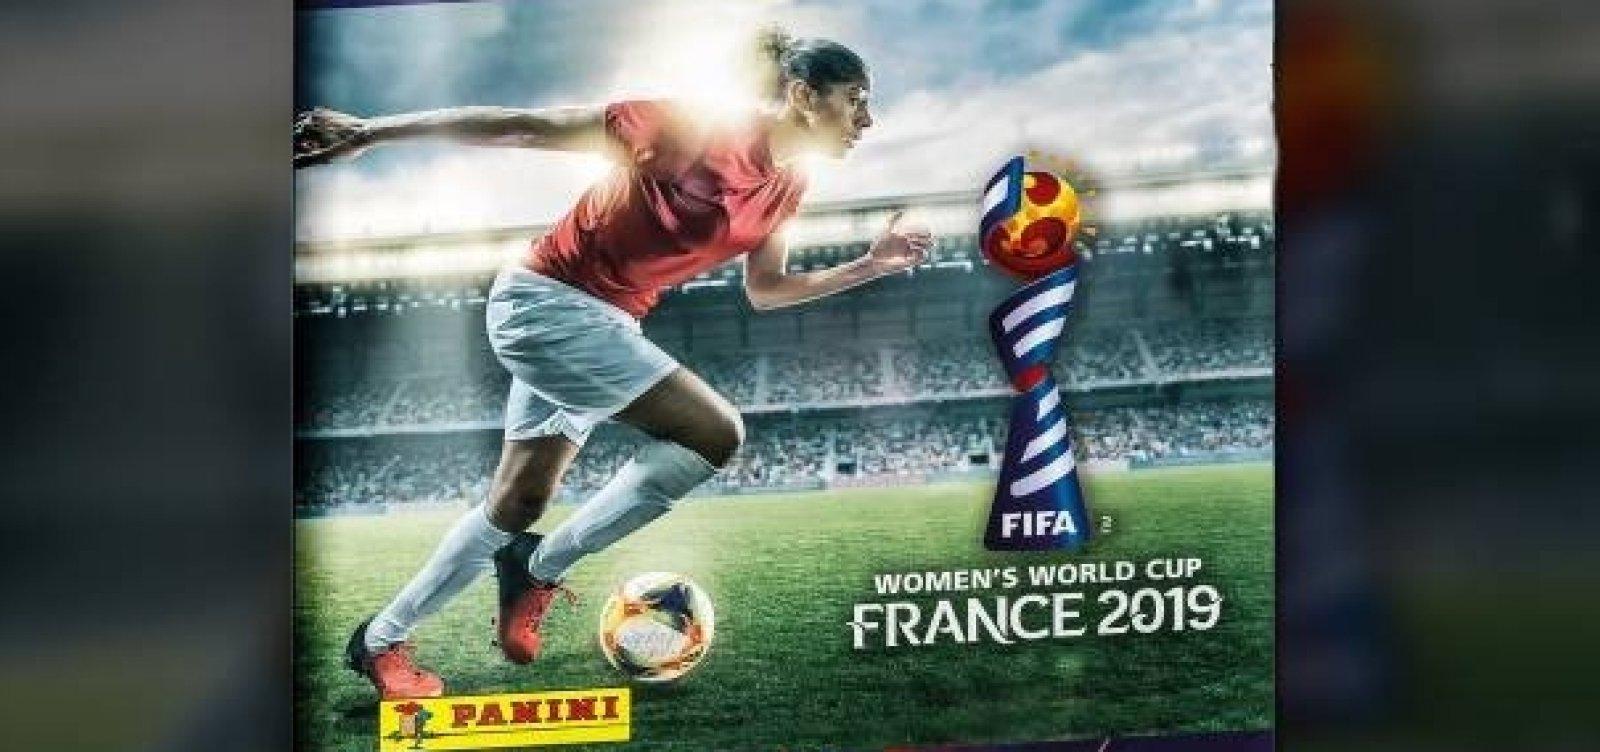 [Copa do Mundo feminina terá álbum da Panini]